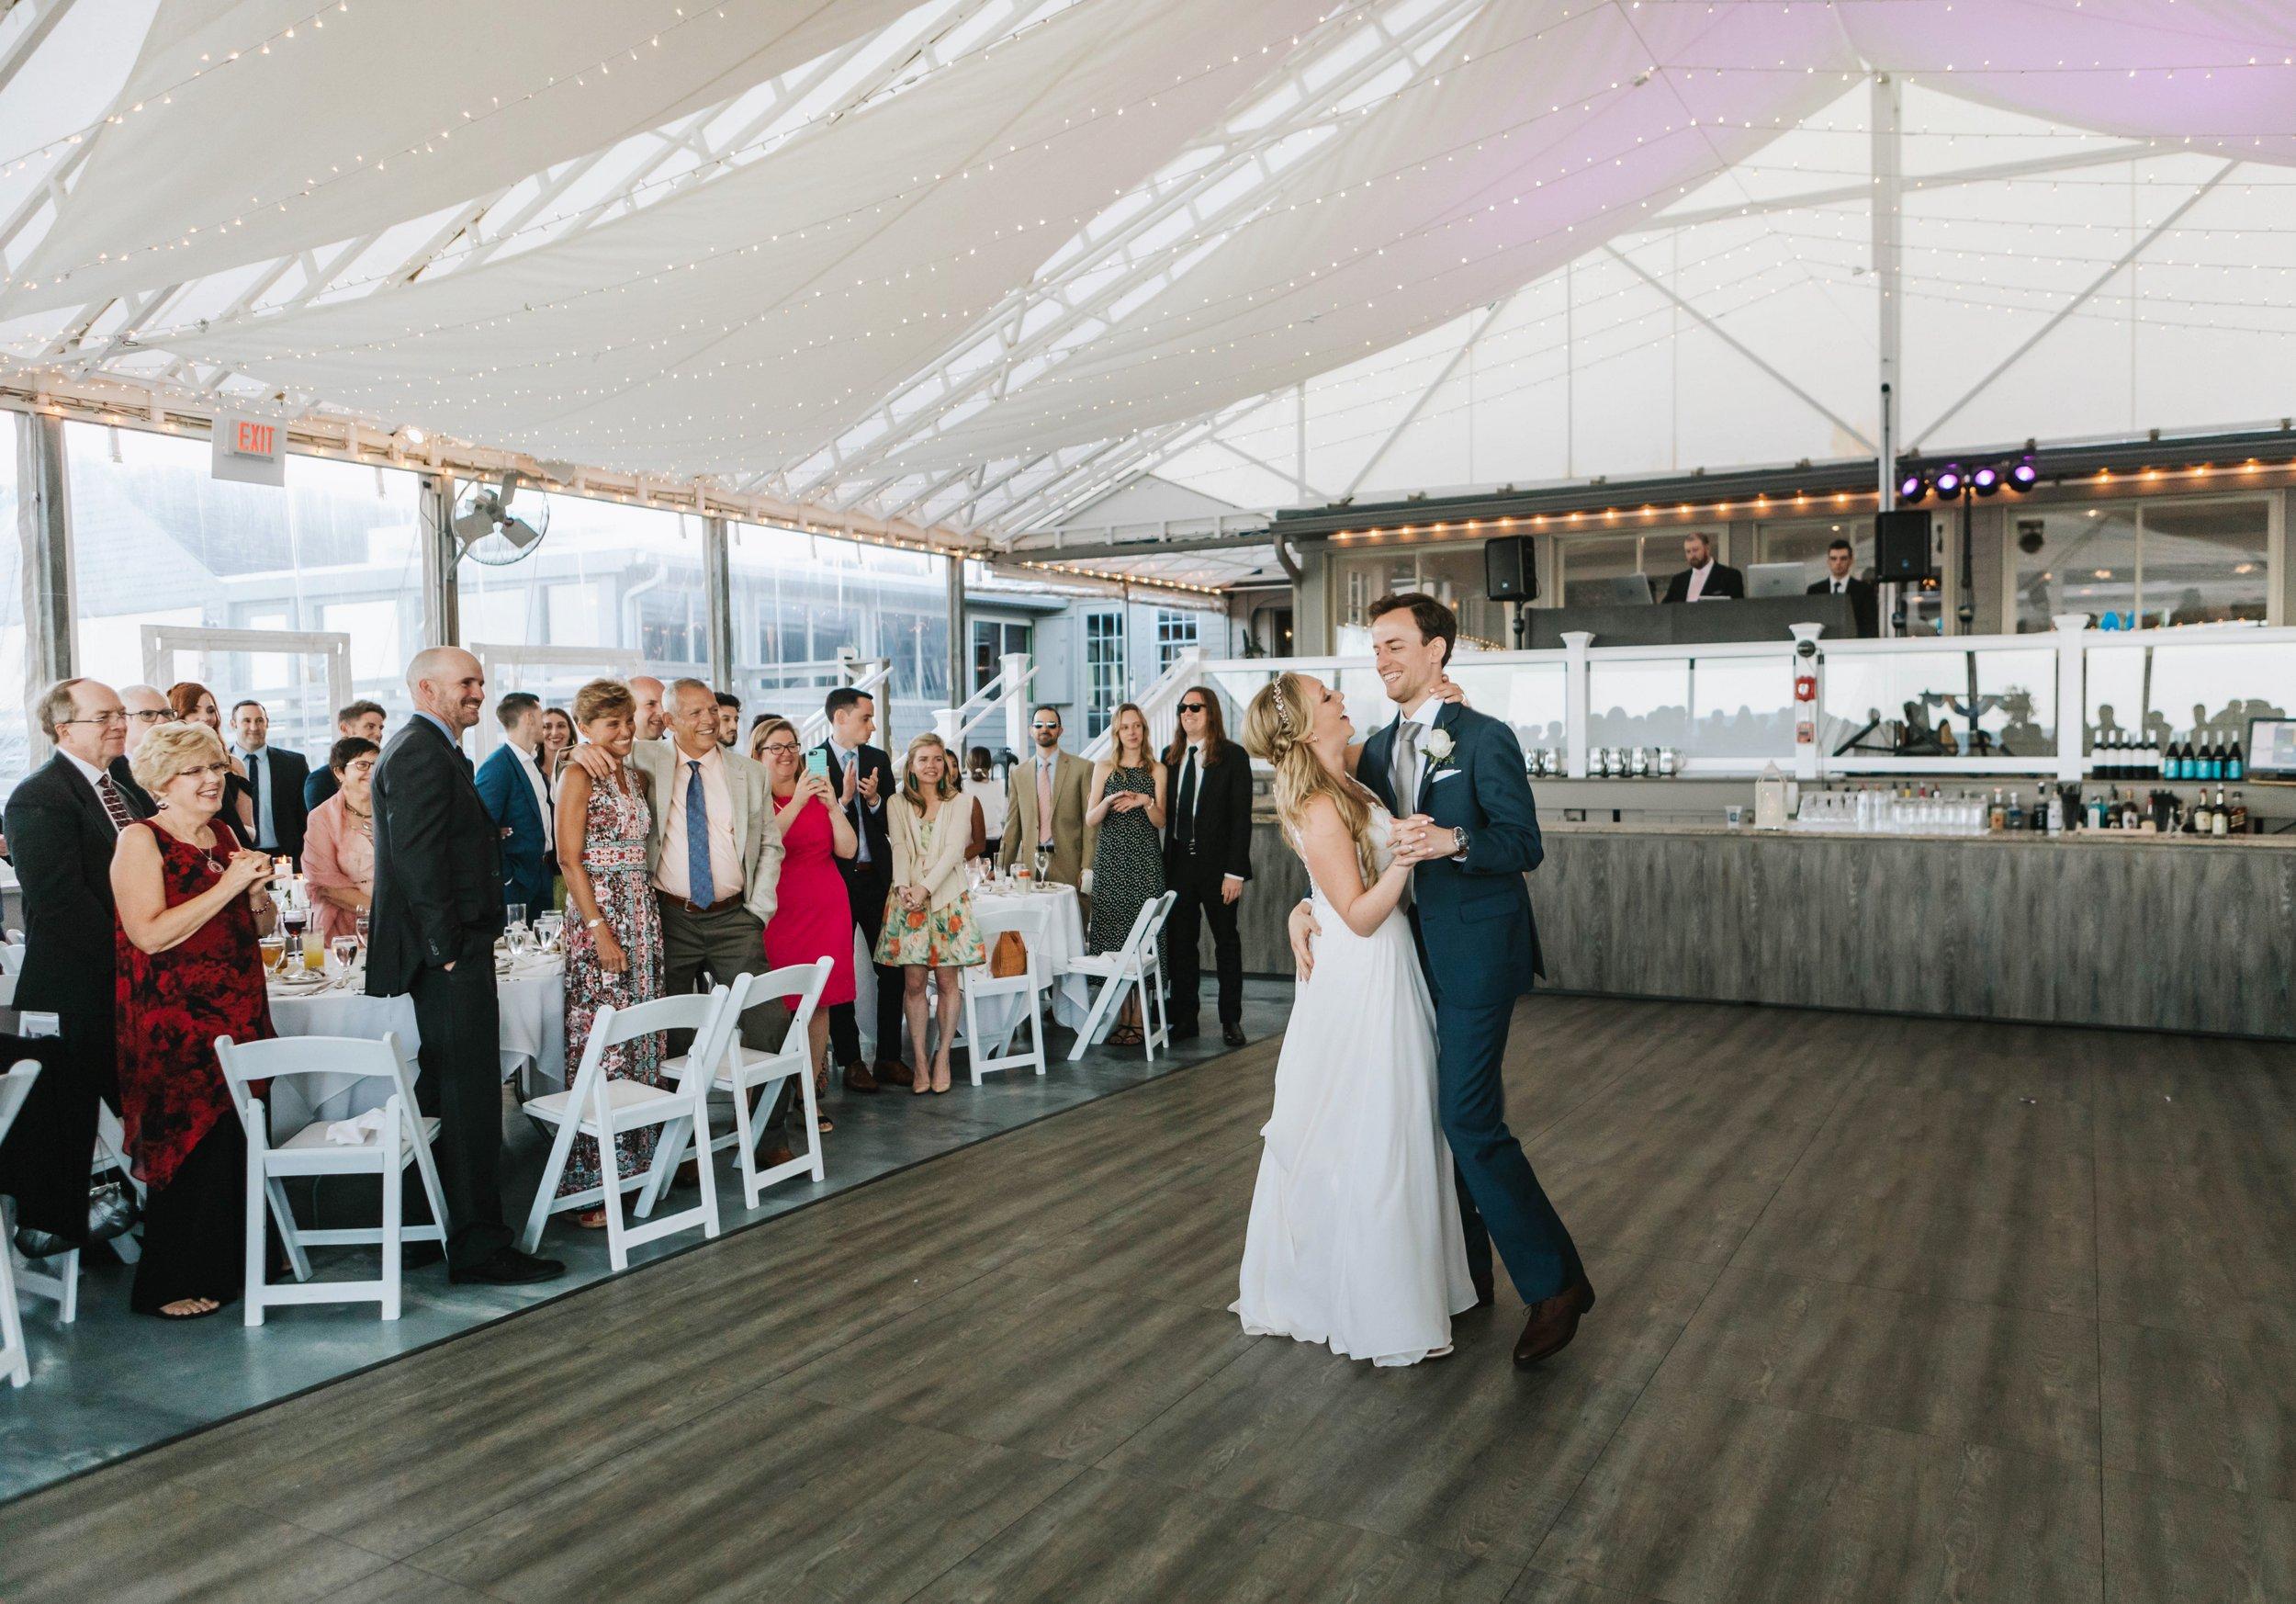 Popponesset-Inn-Wedding-Cape-Cod-Lena-Mirisola-Photography-42.jpg